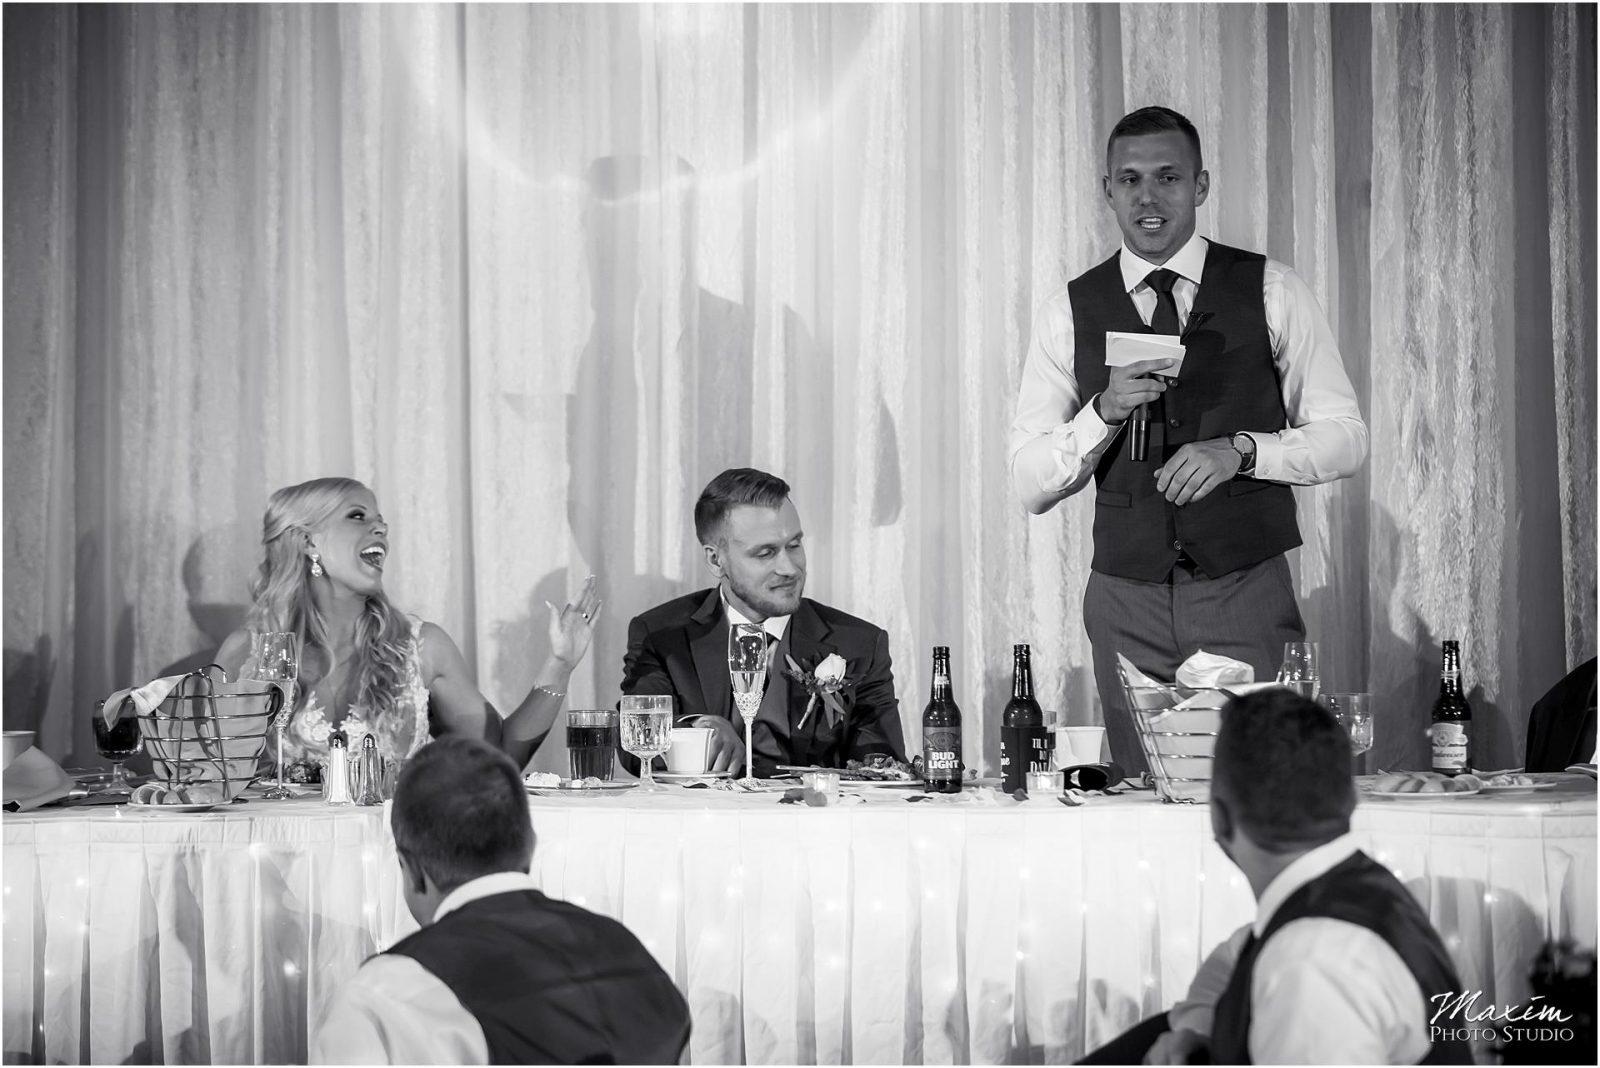 Holiday Inn Airport Wedding, Kentucky Wedding Photographer, Wedding Reception Toasts